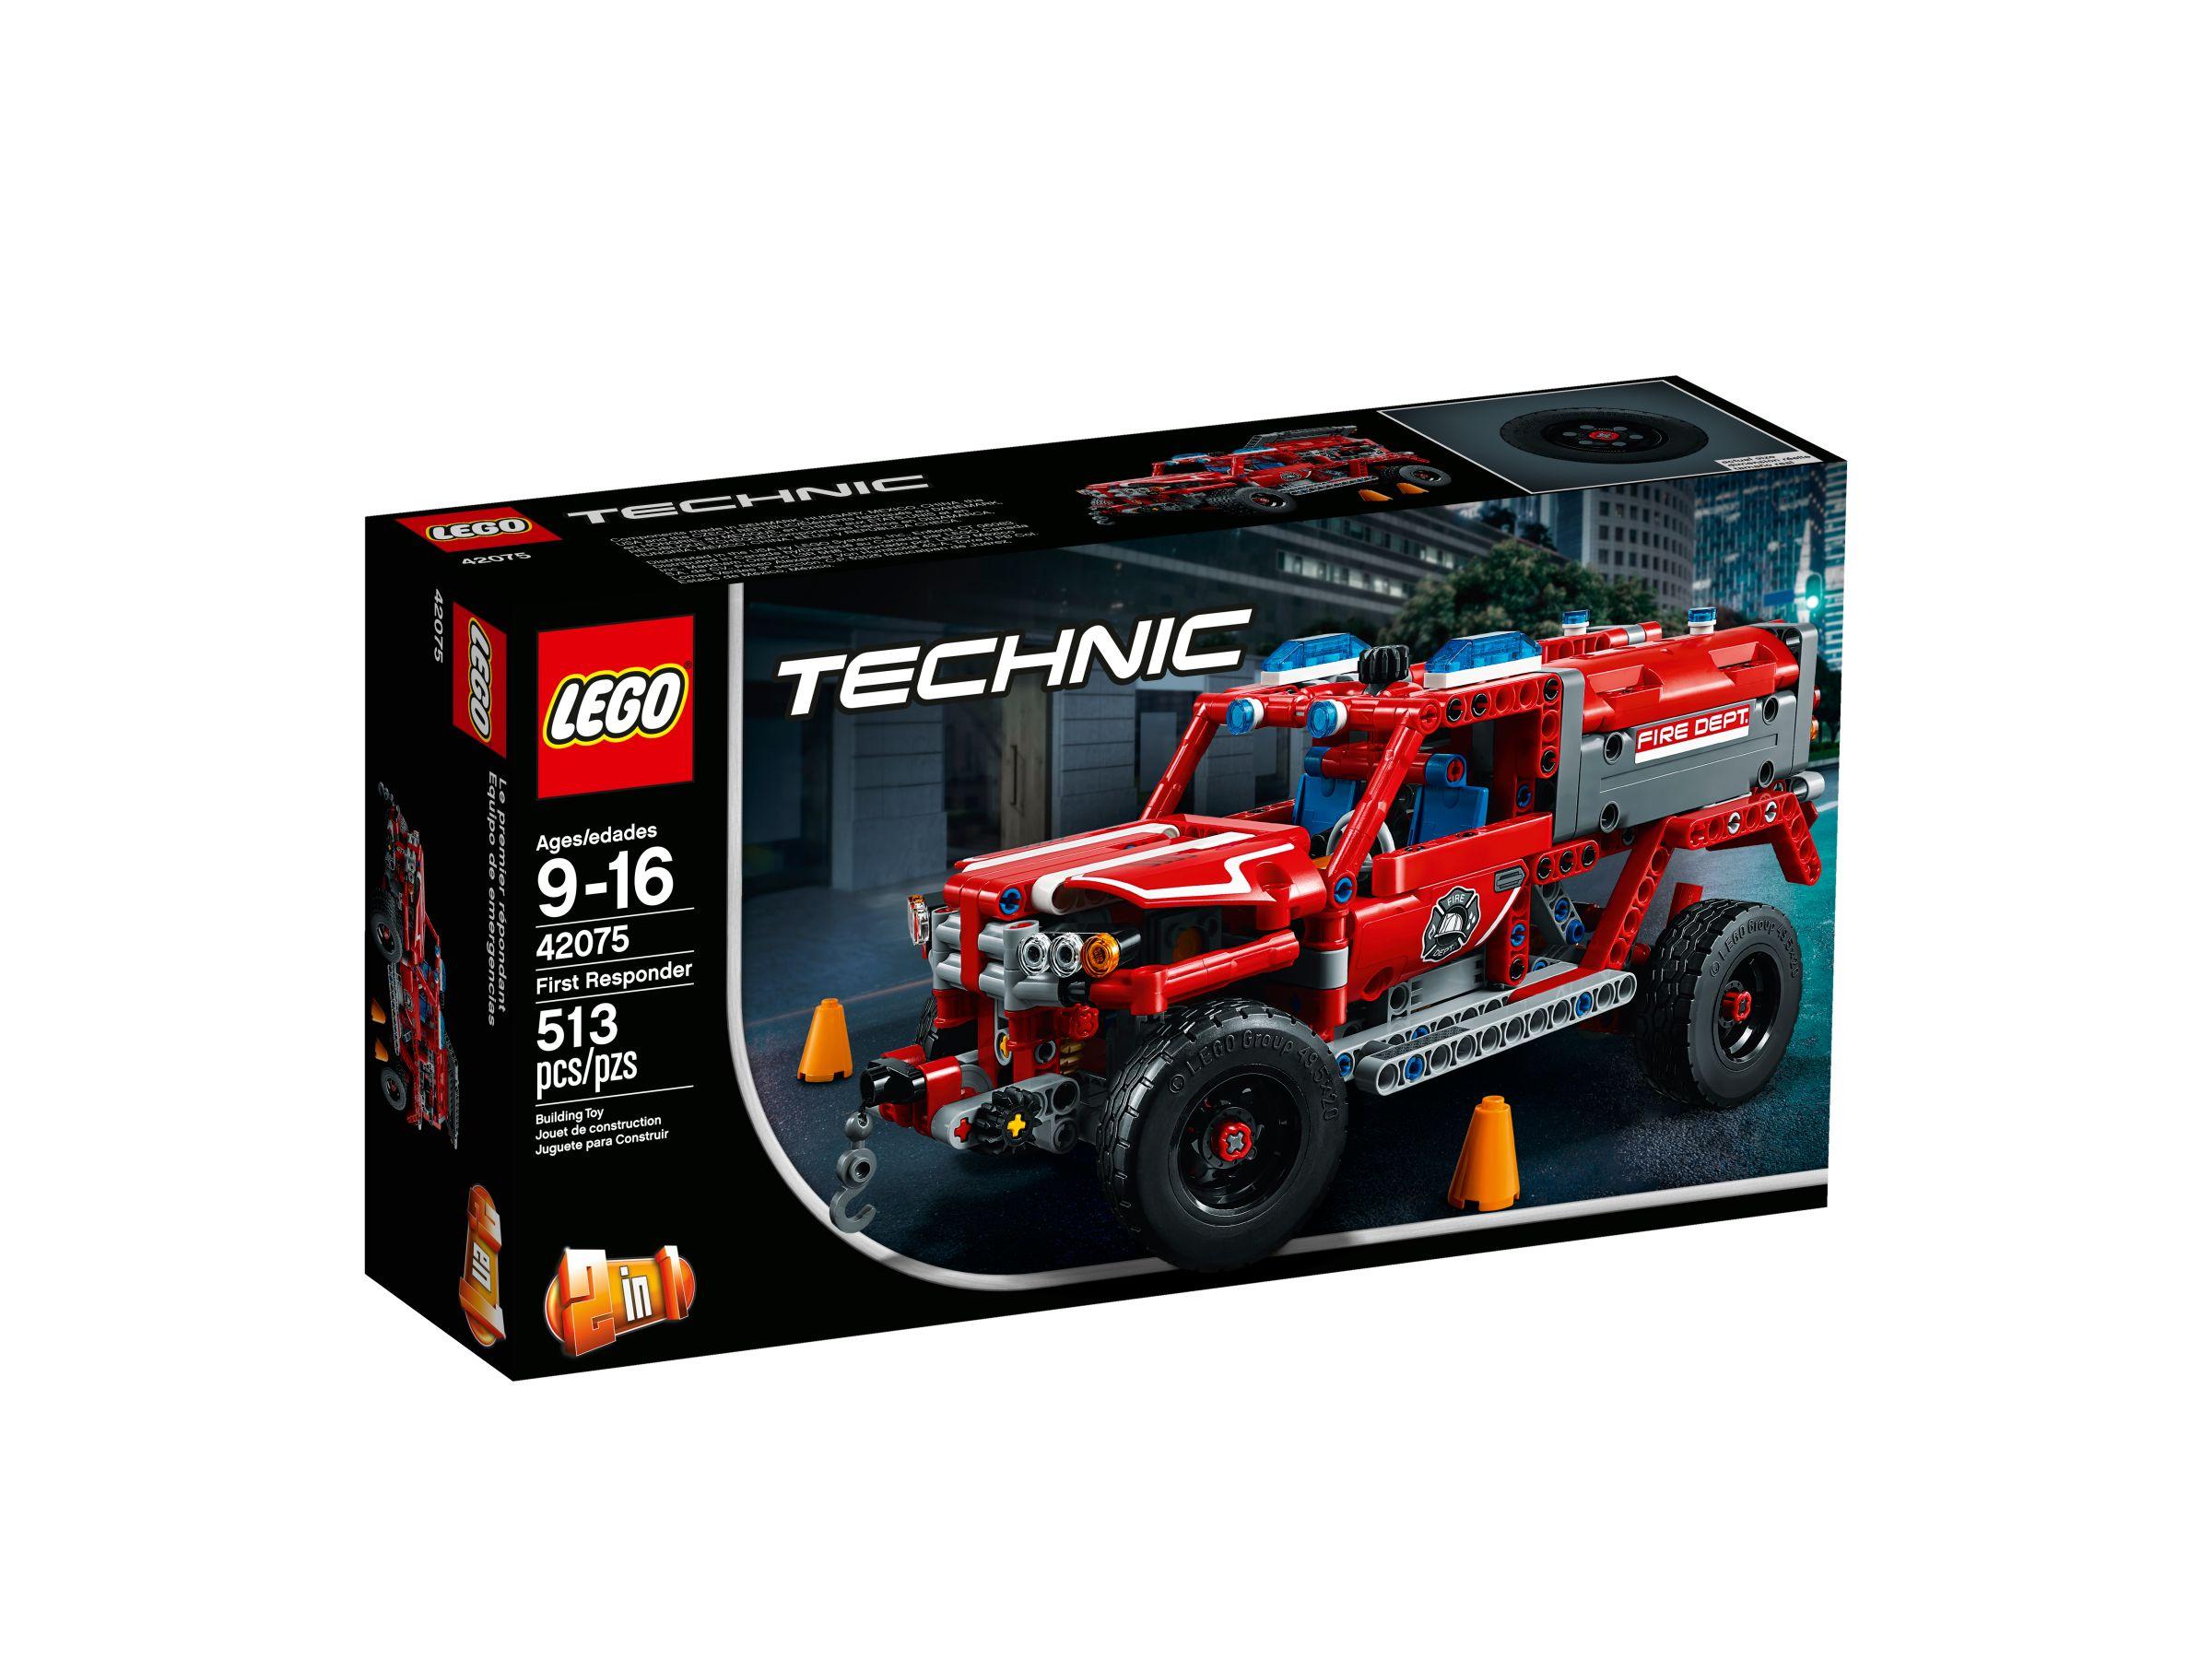 lego technic 42075 first responder ab 27 97 30 gespart. Black Bedroom Furniture Sets. Home Design Ideas